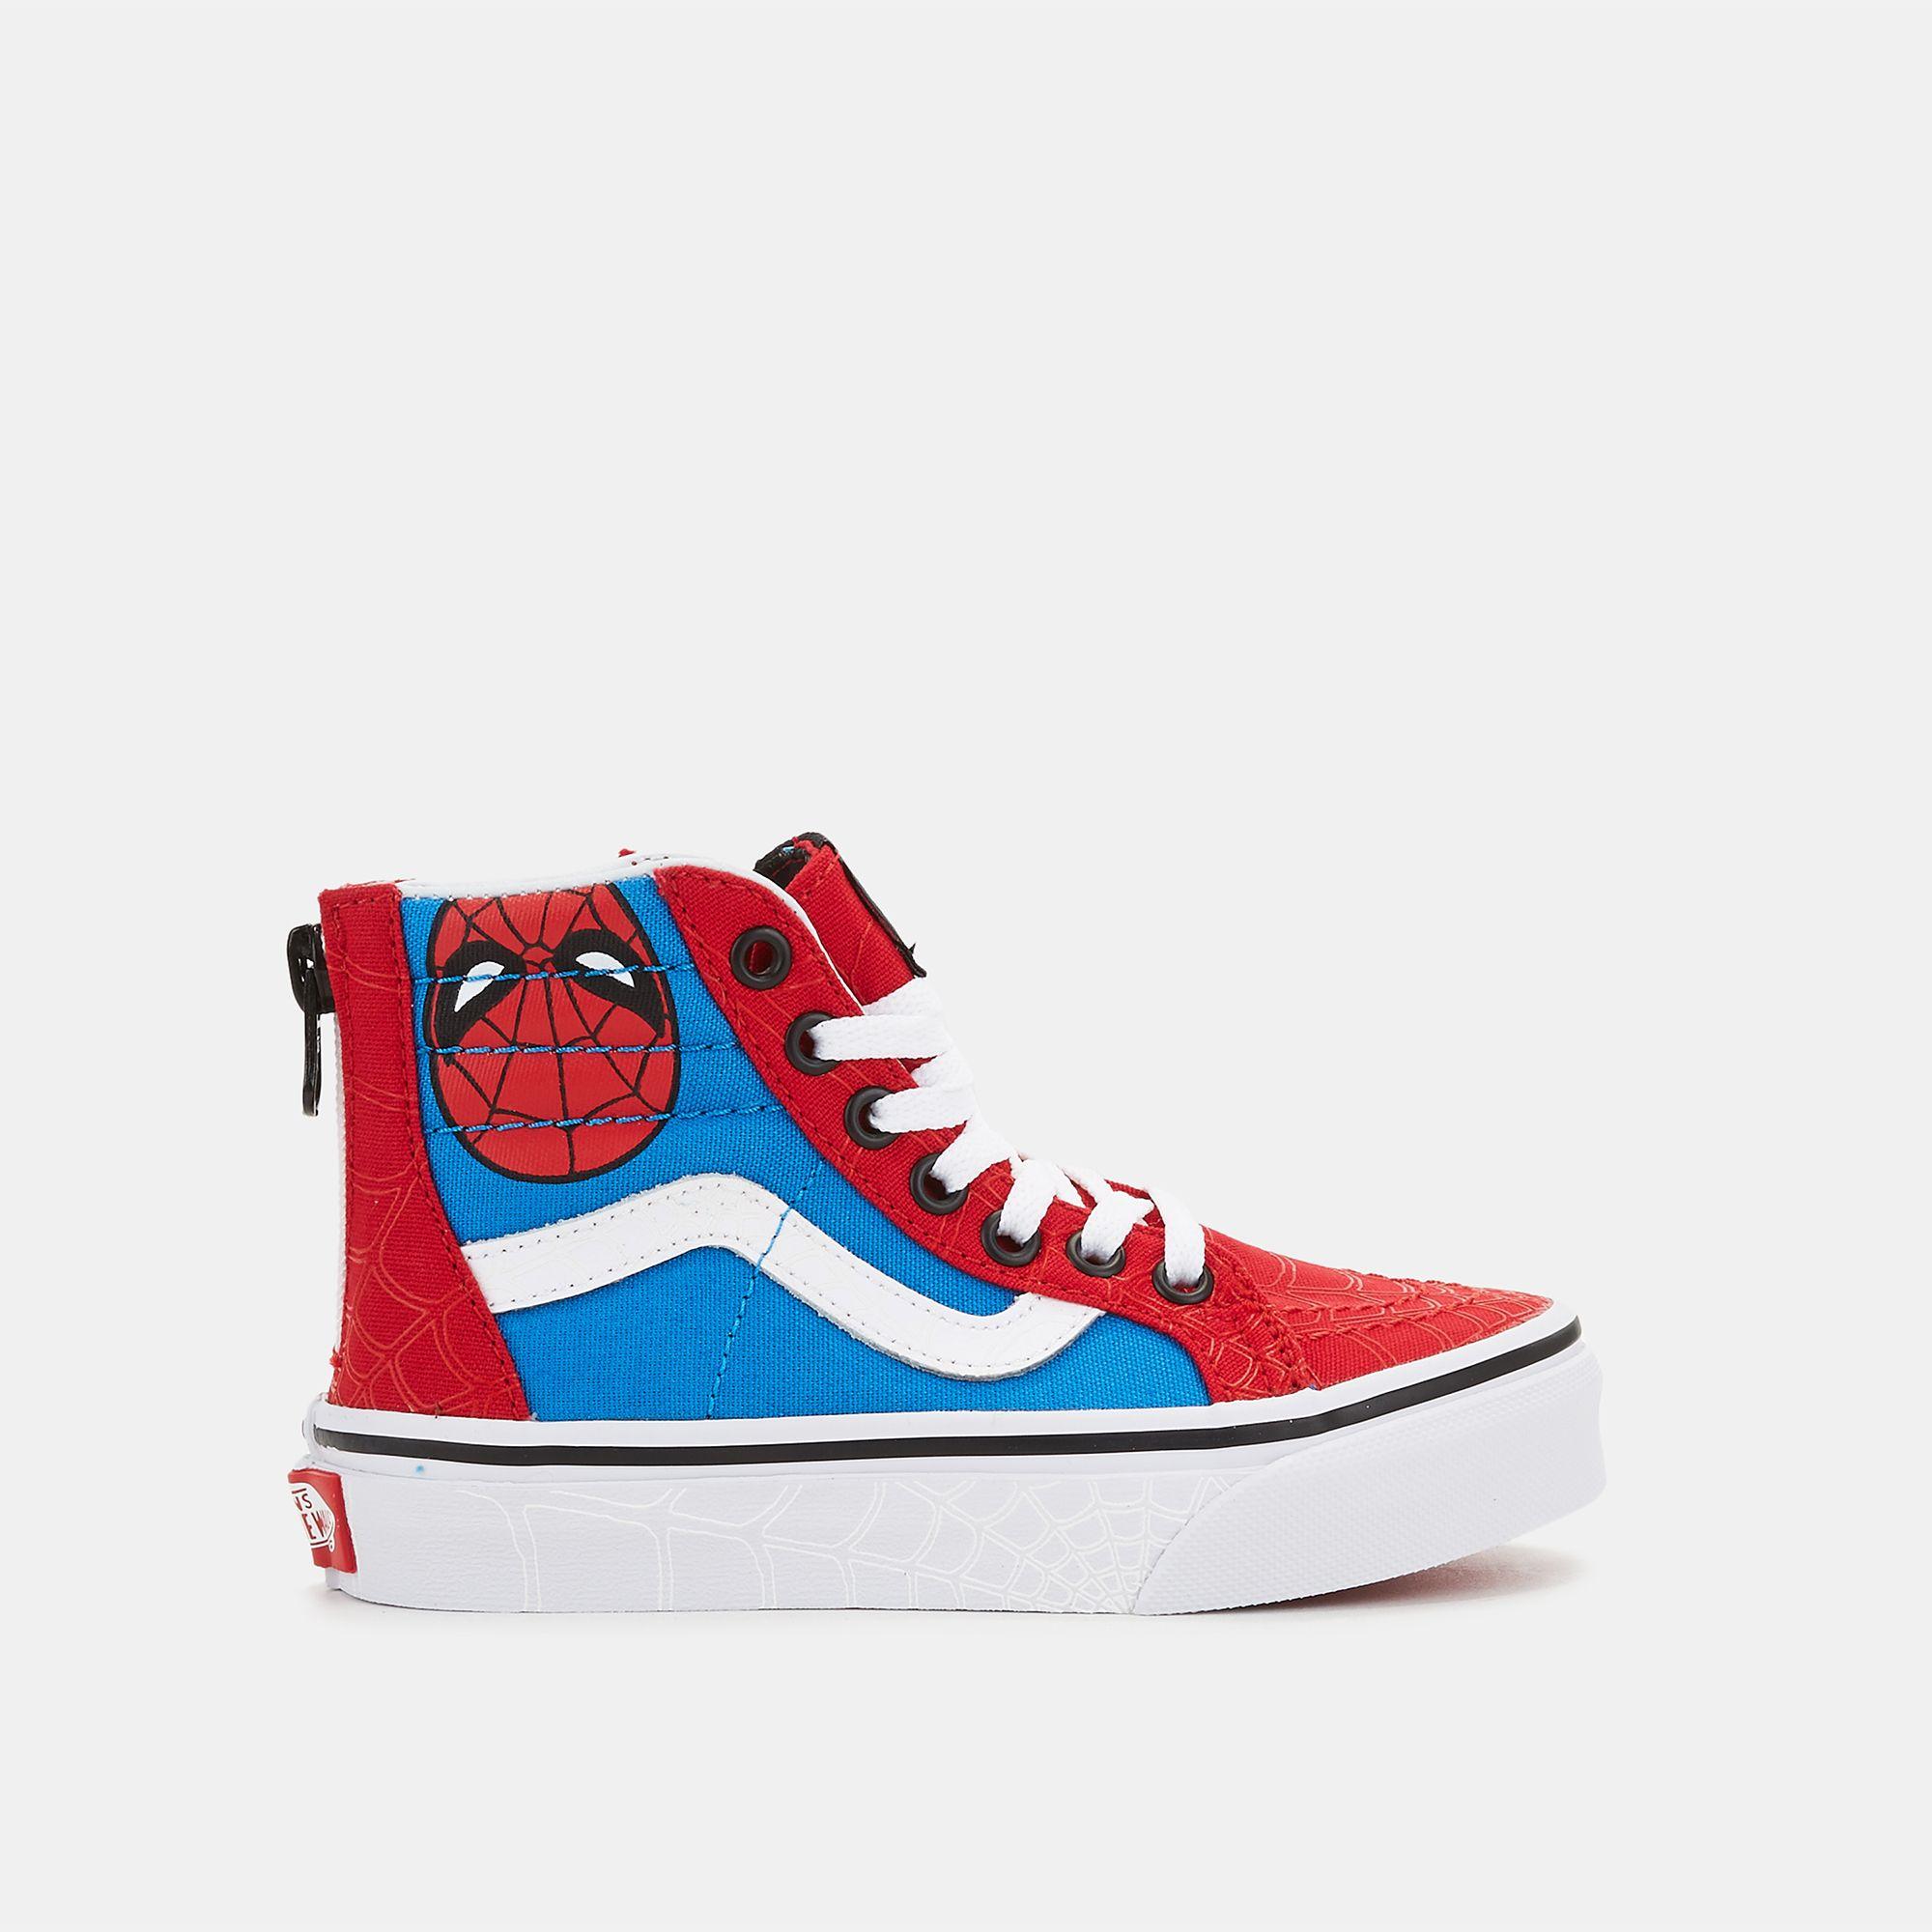 Vans Kids' x Marvel SK8 Hi Zip Shoe | Skateboarding Shoes